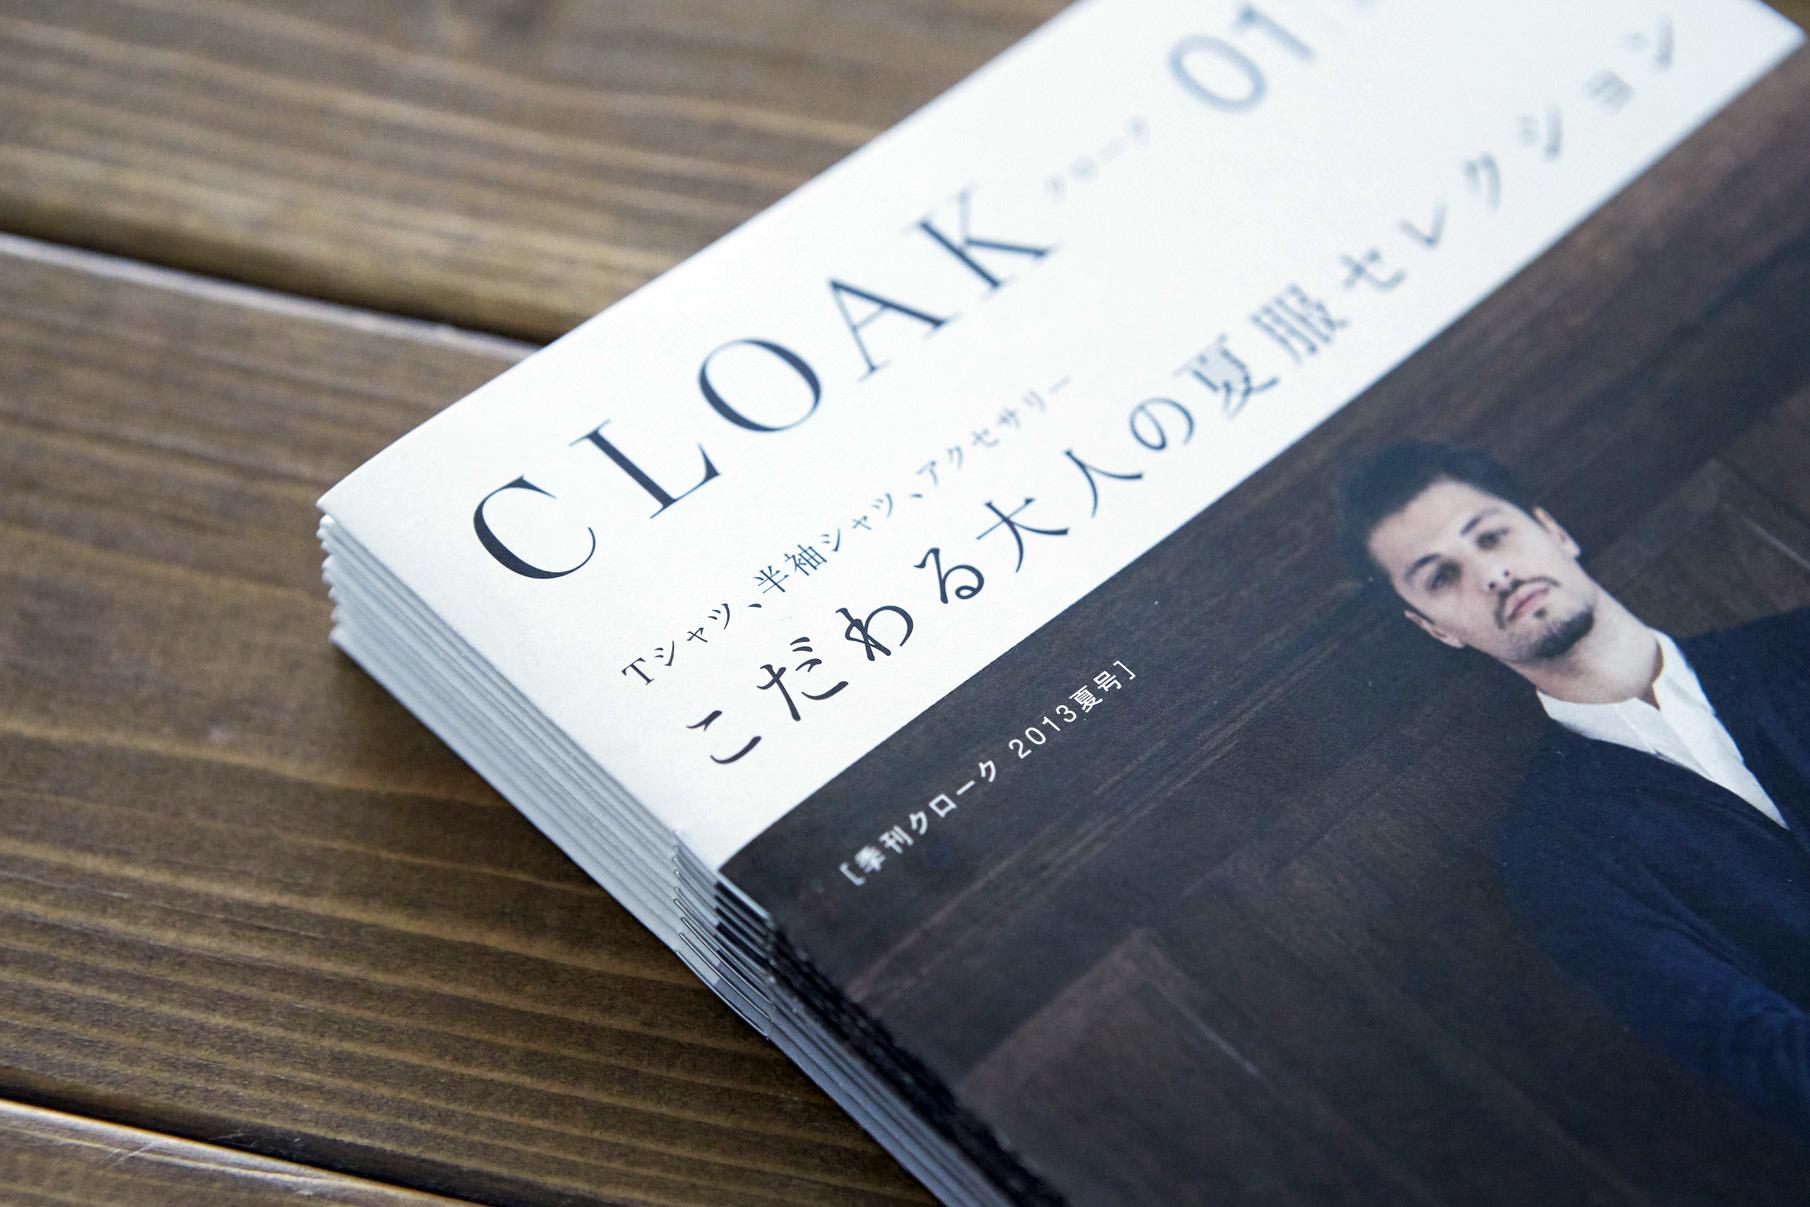 CLOAK Vol.1, Vol.2 - Free Paper 3